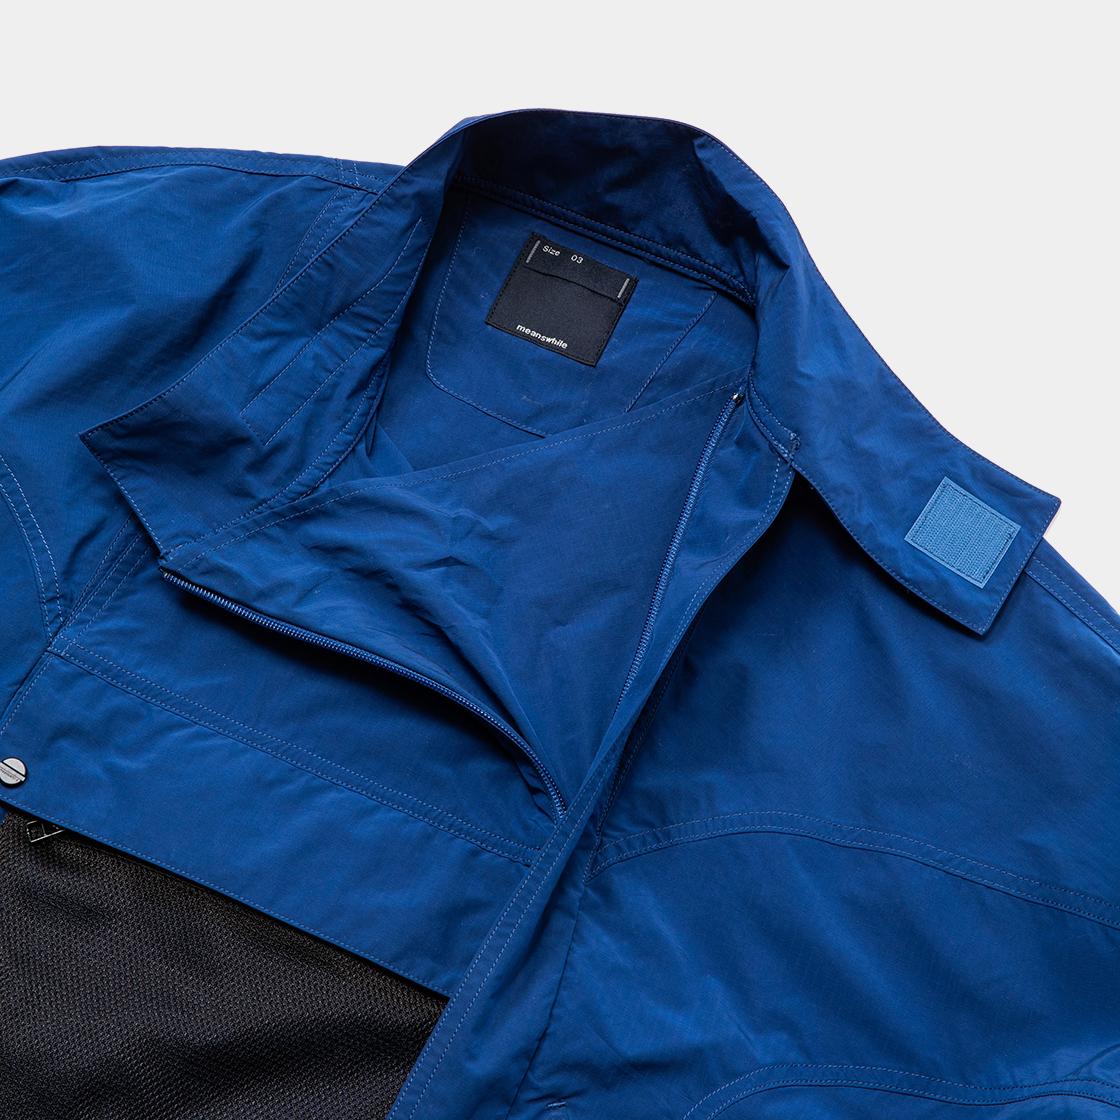 Tech Ripstop Combine SH / Ink Blue